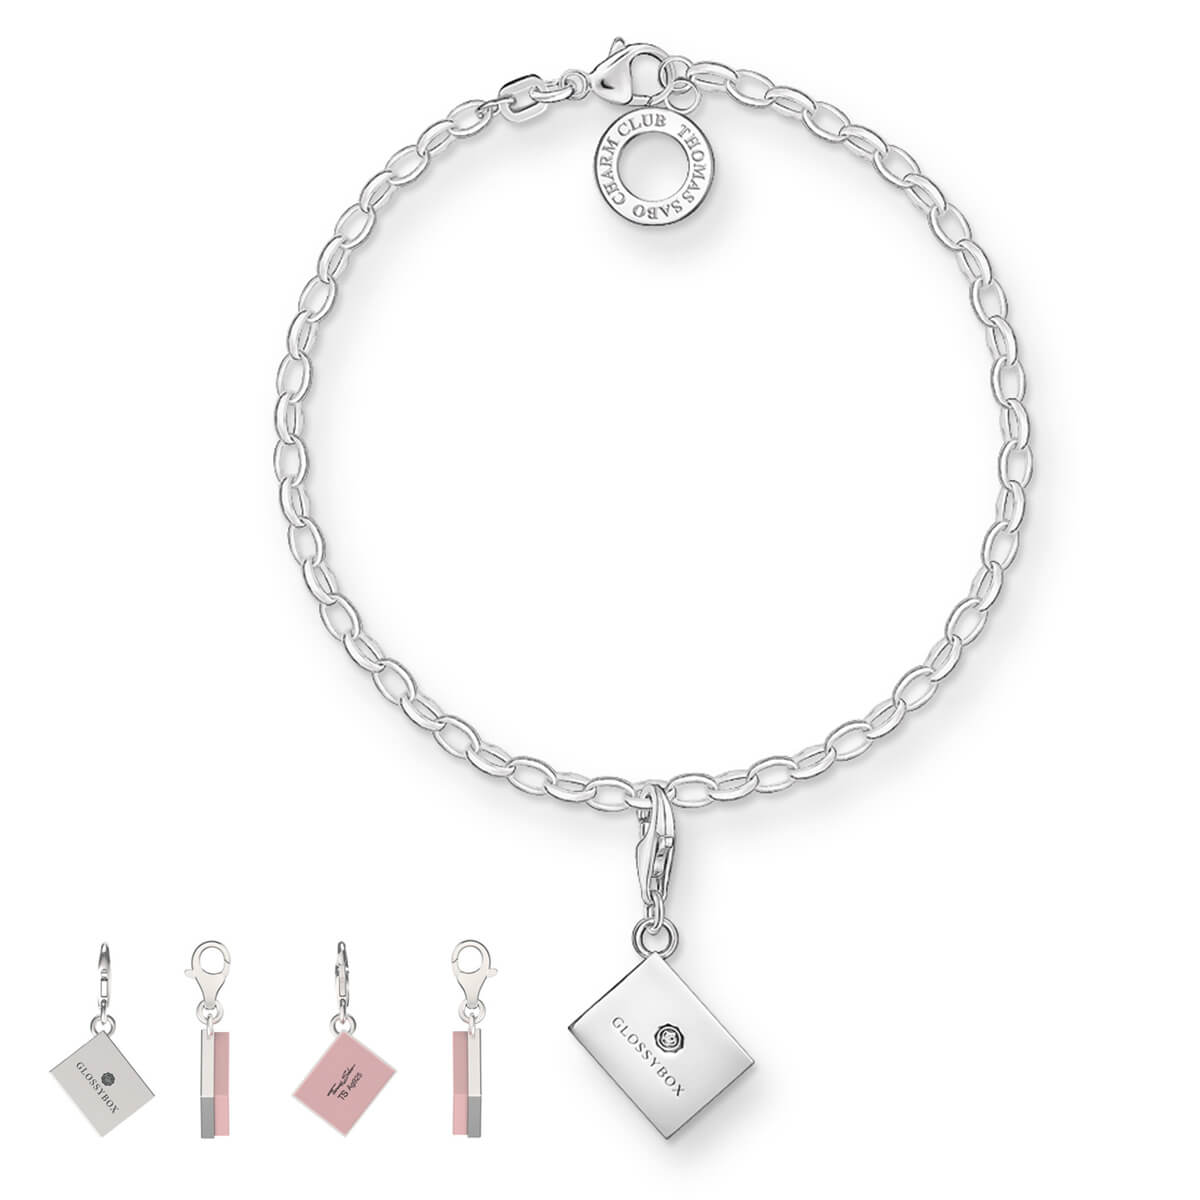 THOMAS SABO x GLOSSYBOX : Charm & Bracelet